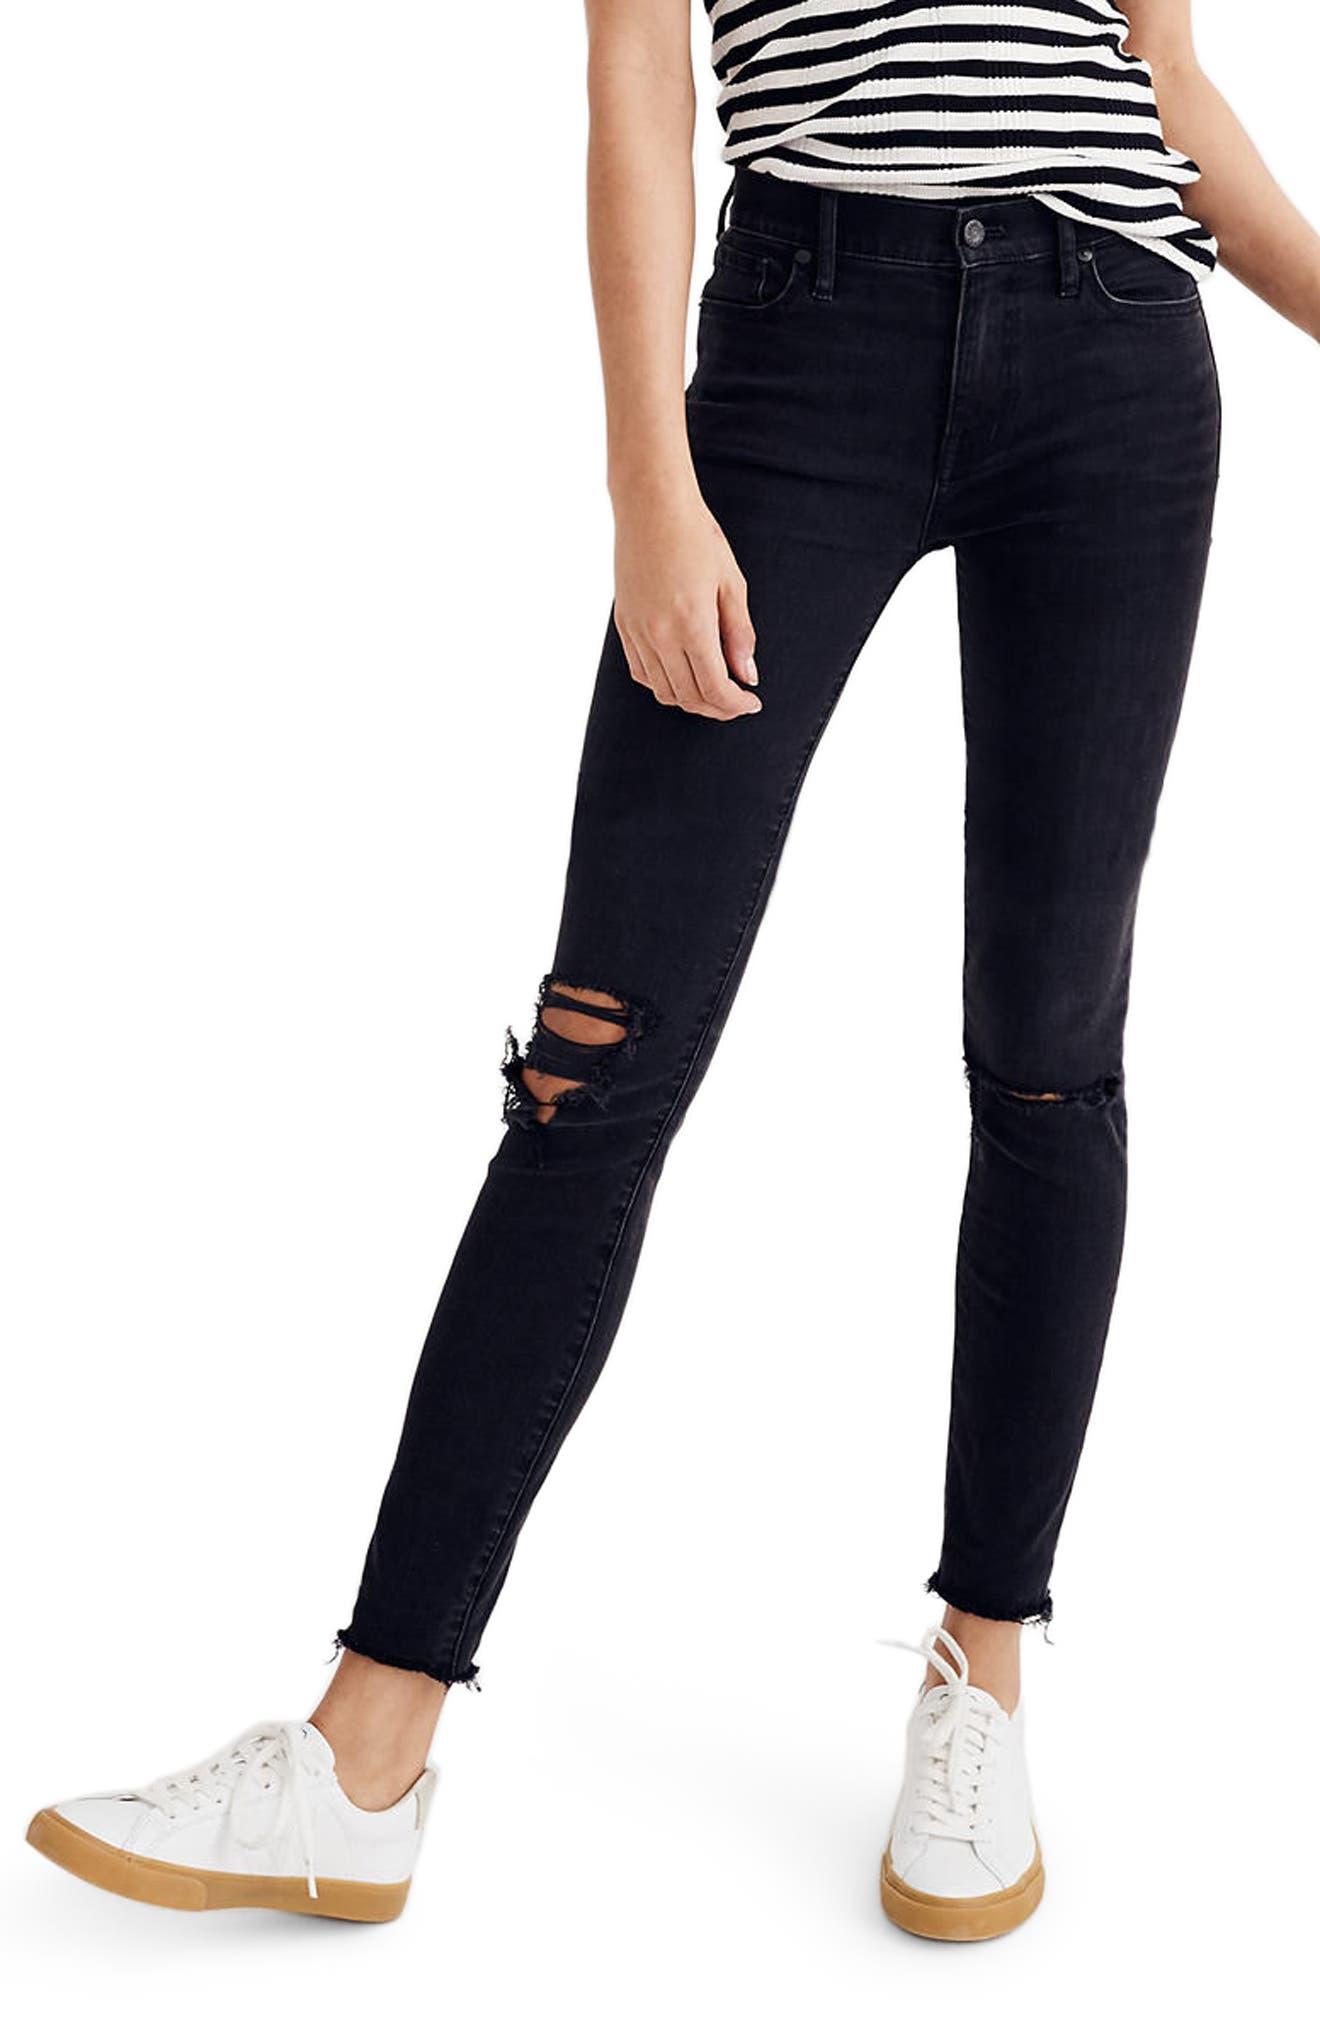 9-Inch High Waist Skinny Jeans,                             Main thumbnail 1, color,                             Black Sea